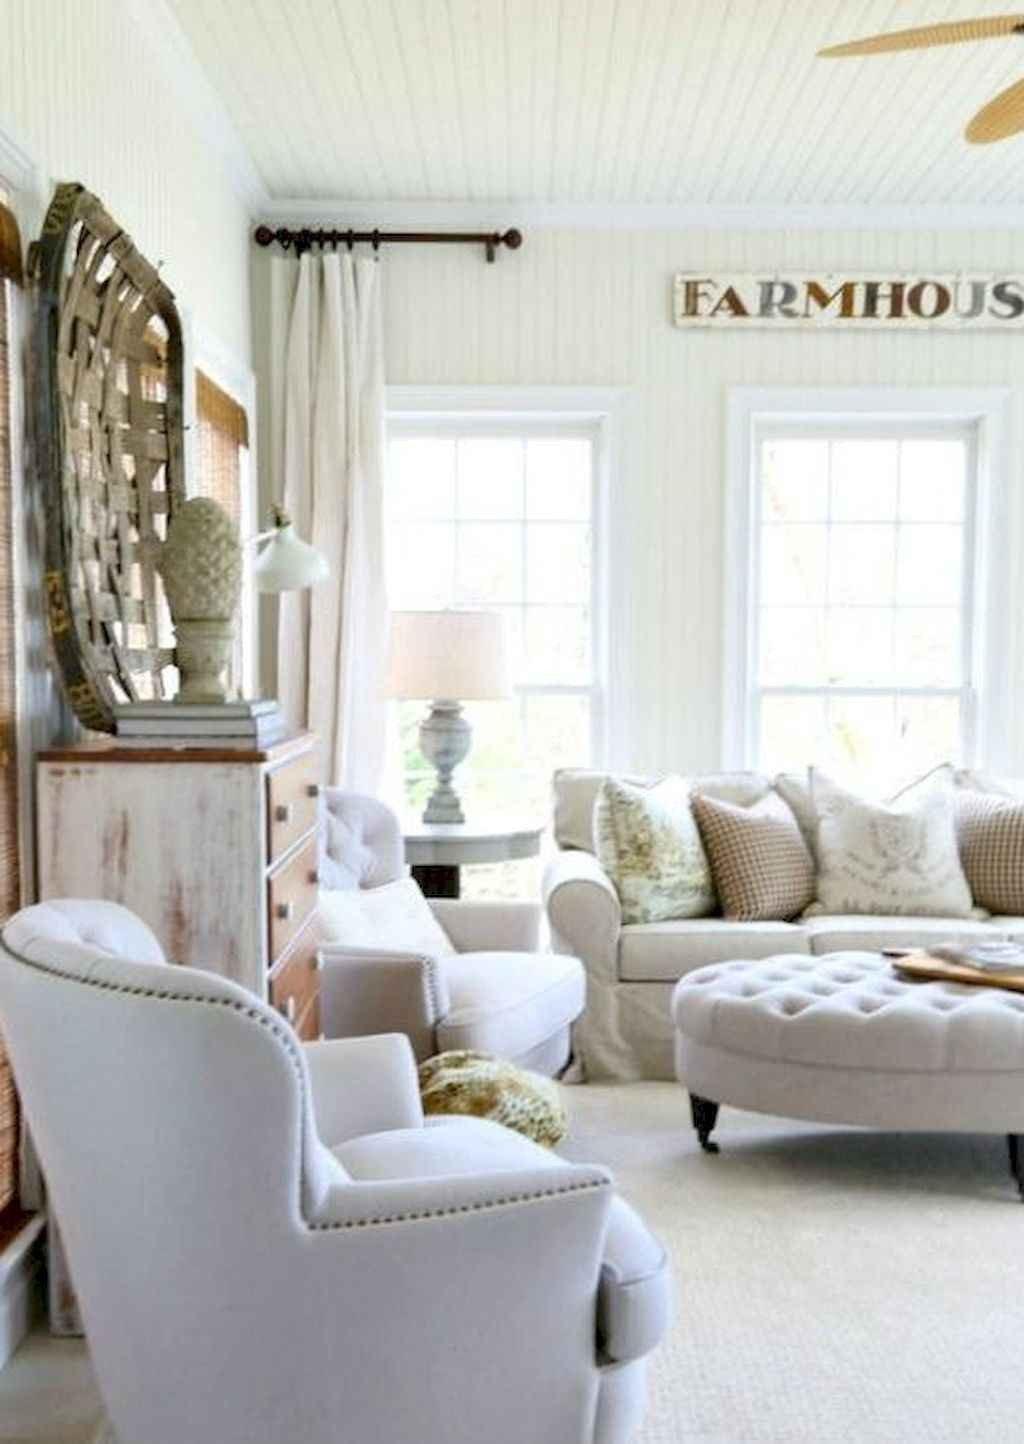 Modern Farmhouse Living Room Decorating Ideas Best Of 05 Modern Farmhouse Curtains for Living Room Decorating Ideas Moodecor